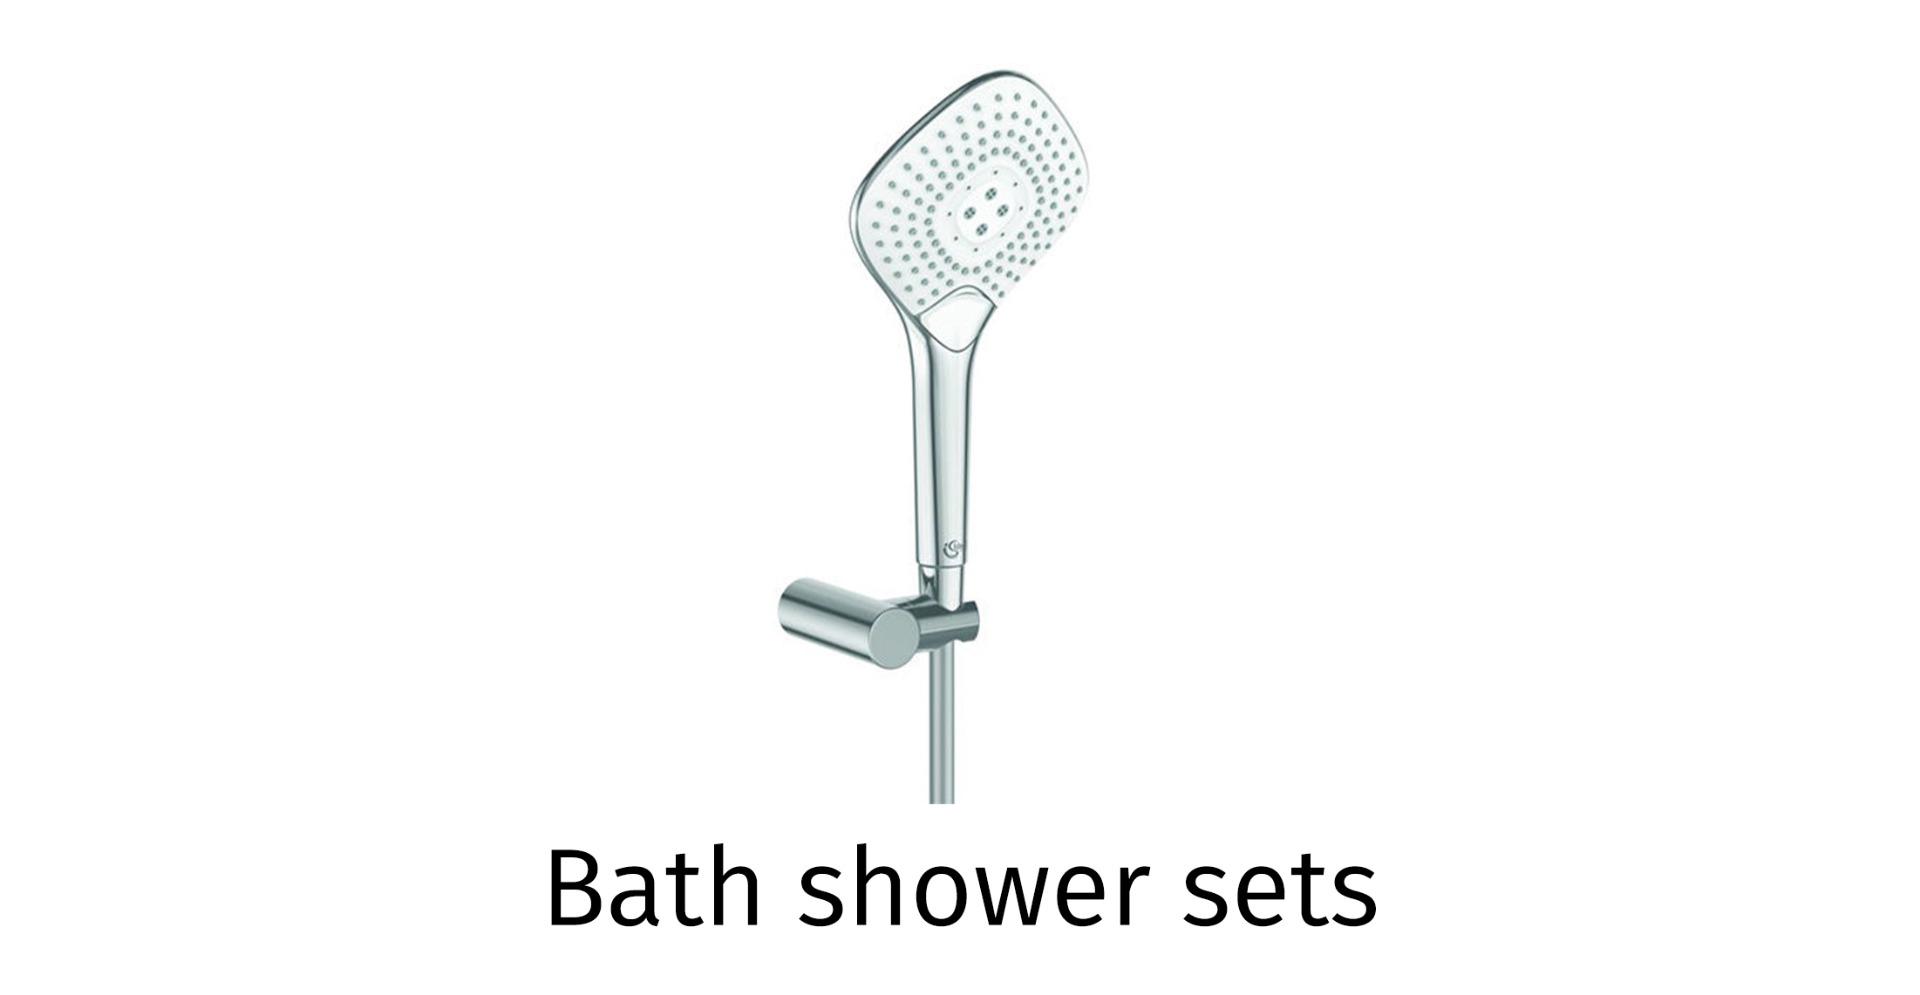 Bath shower sets